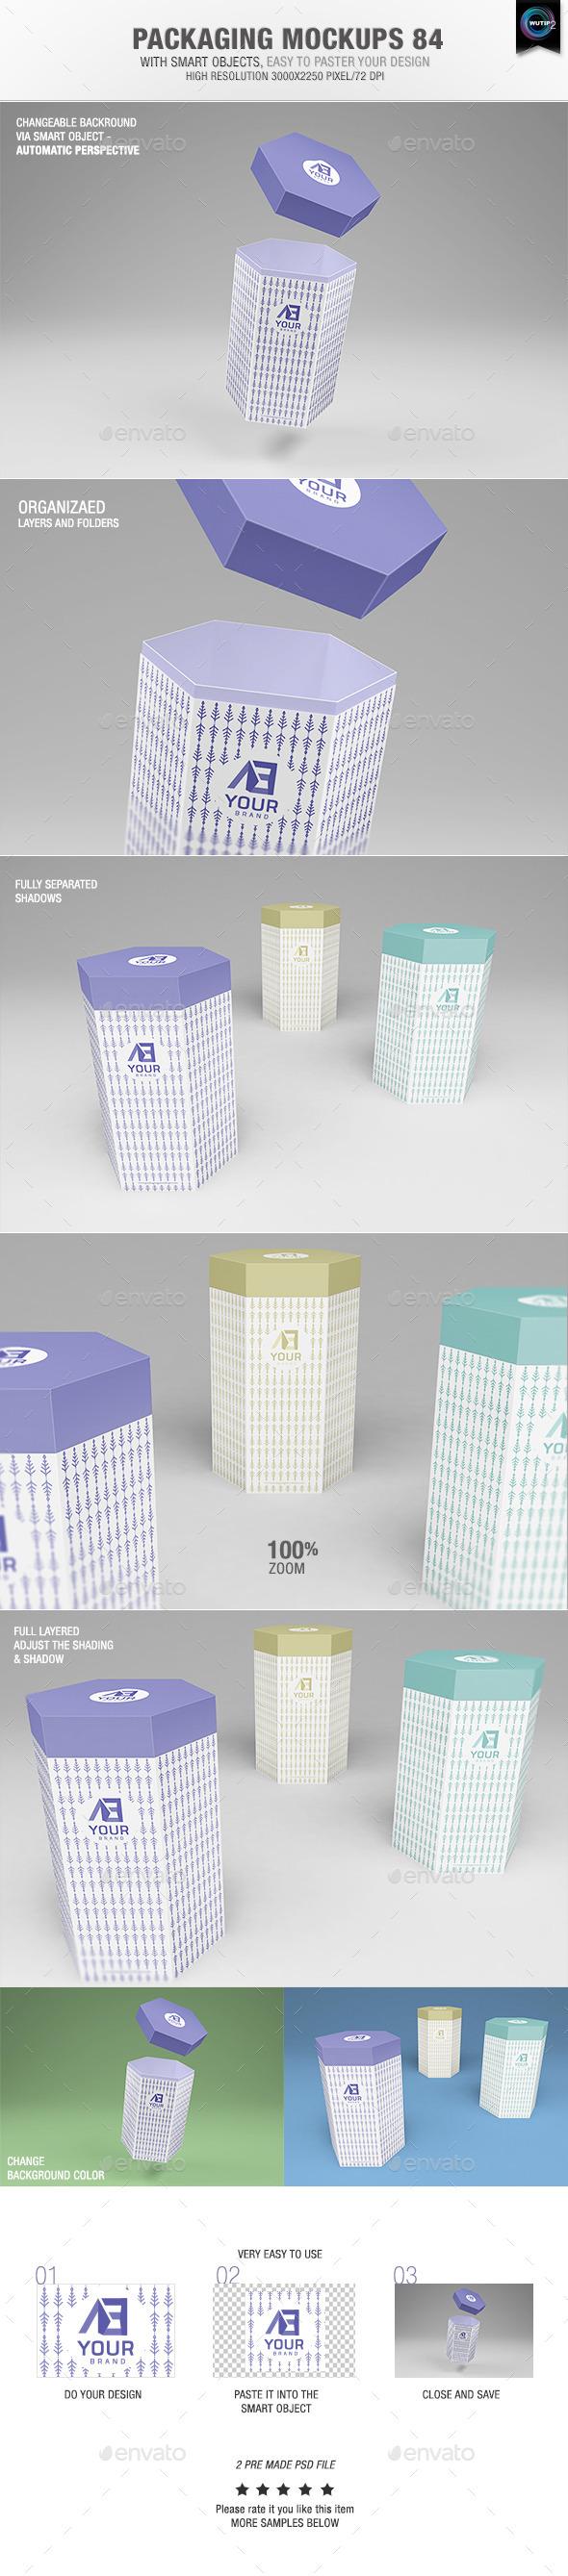 Packaging Mock-ups 84 - Product Mock-Ups Graphics